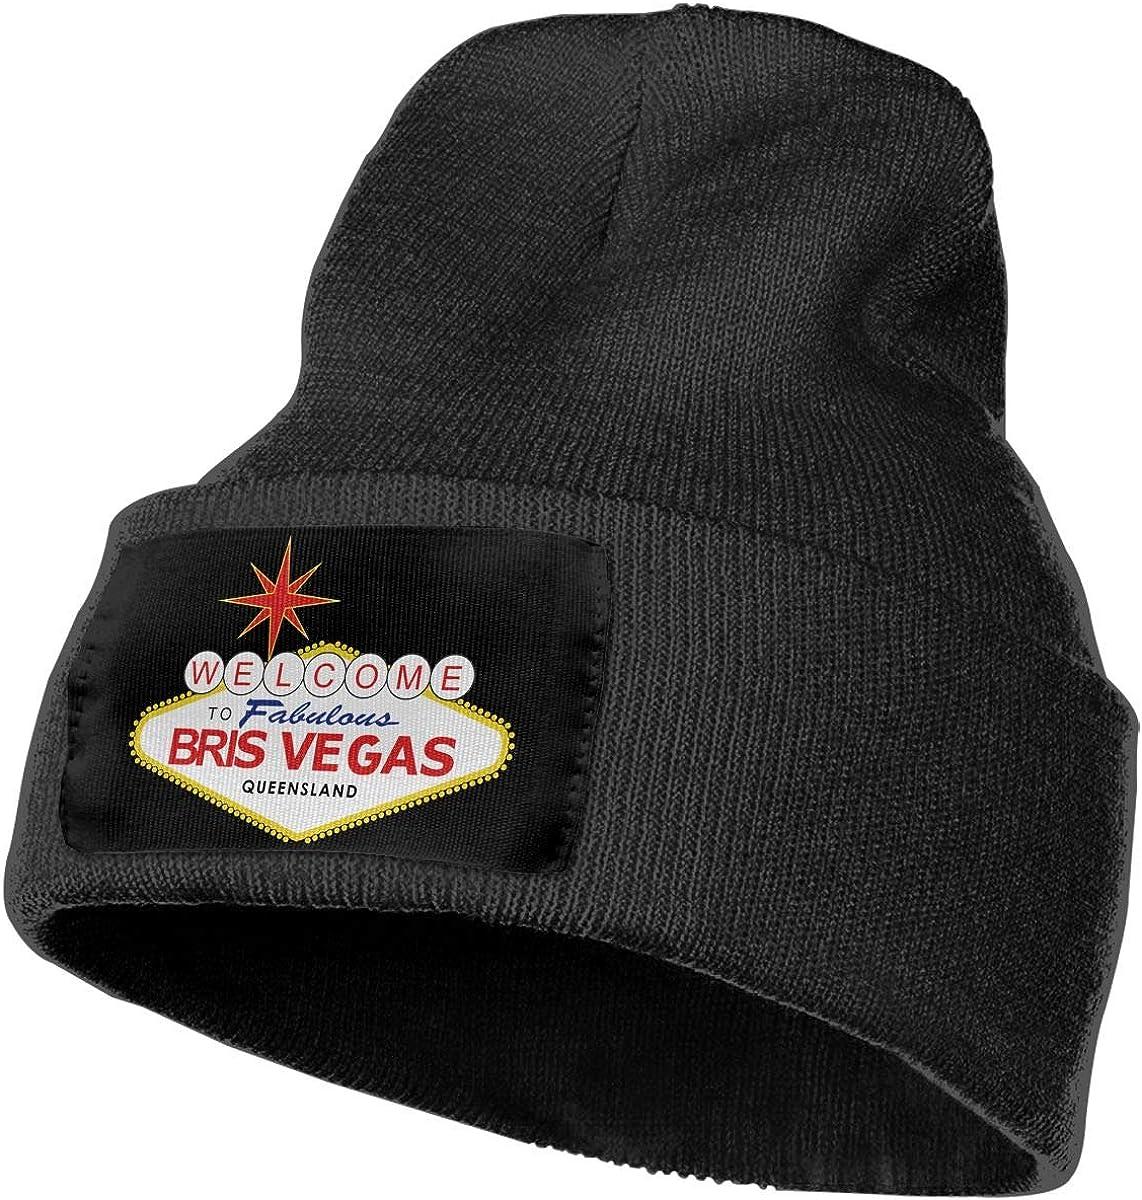 Las Vegas Mens Beanie Cap Skull Cap Winter Warm Knitting Hats.